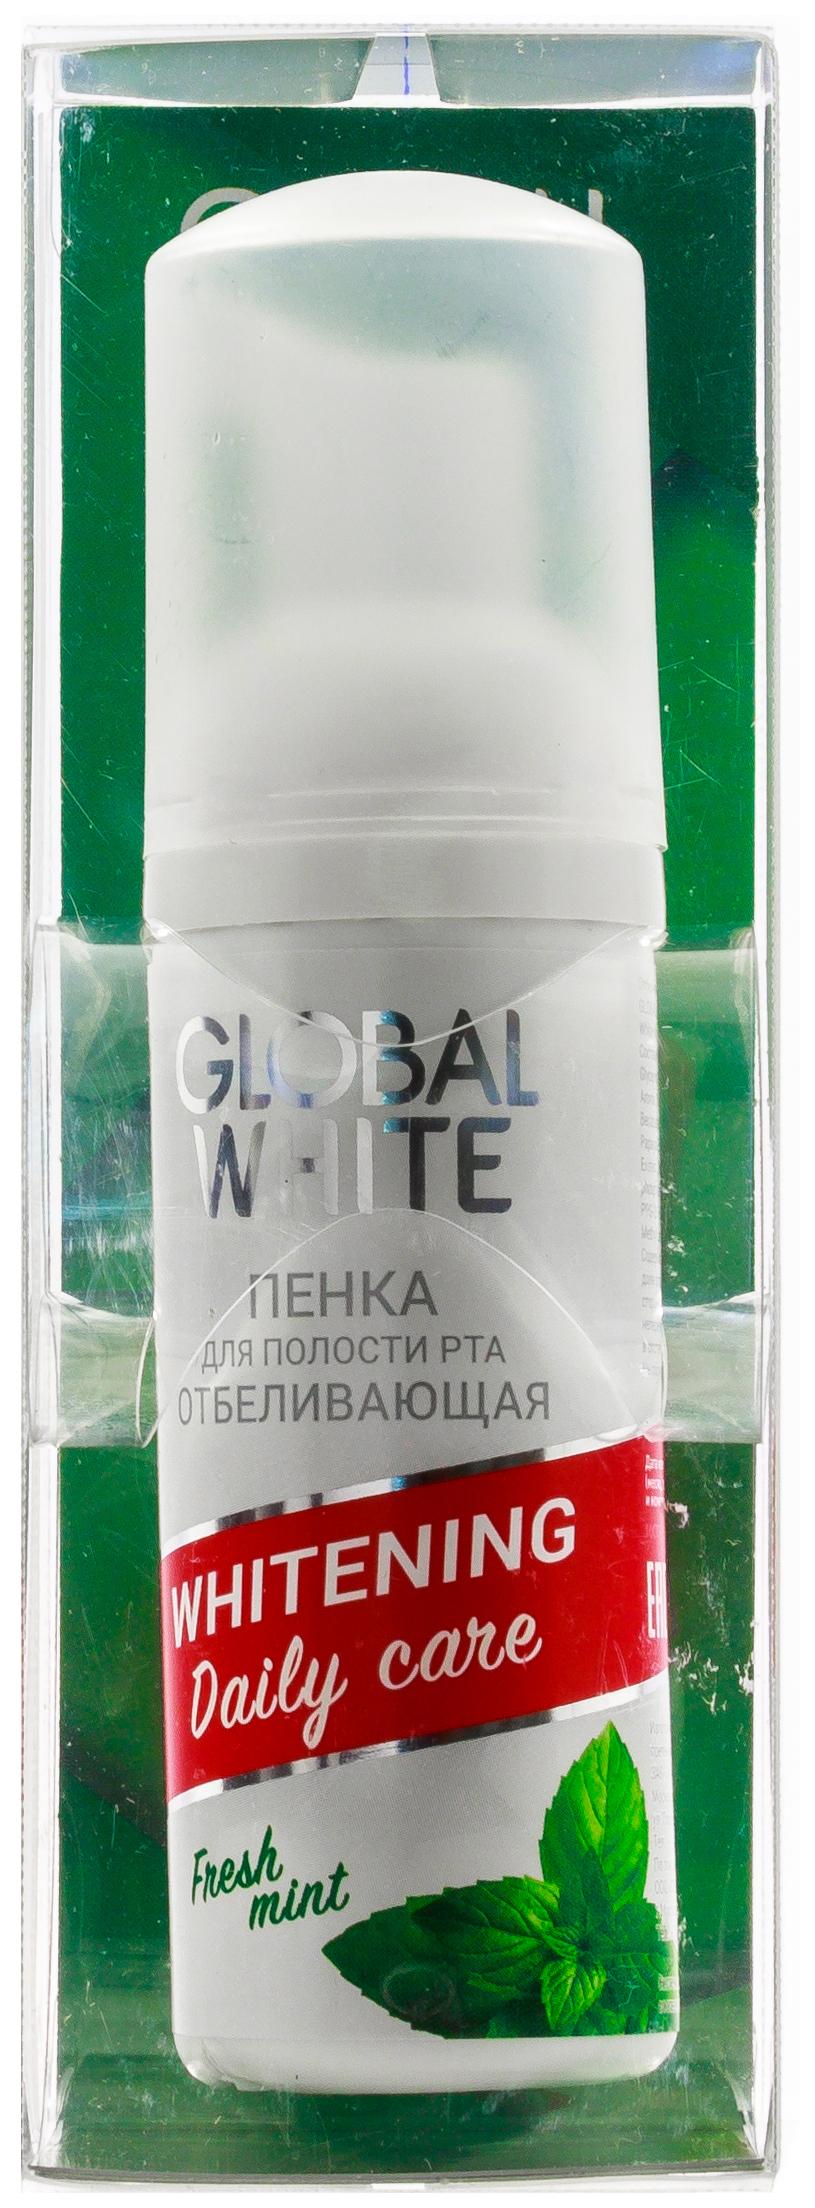 Ополаскиватель для рта Global White Отбеливающая Свежая мята 50 мл